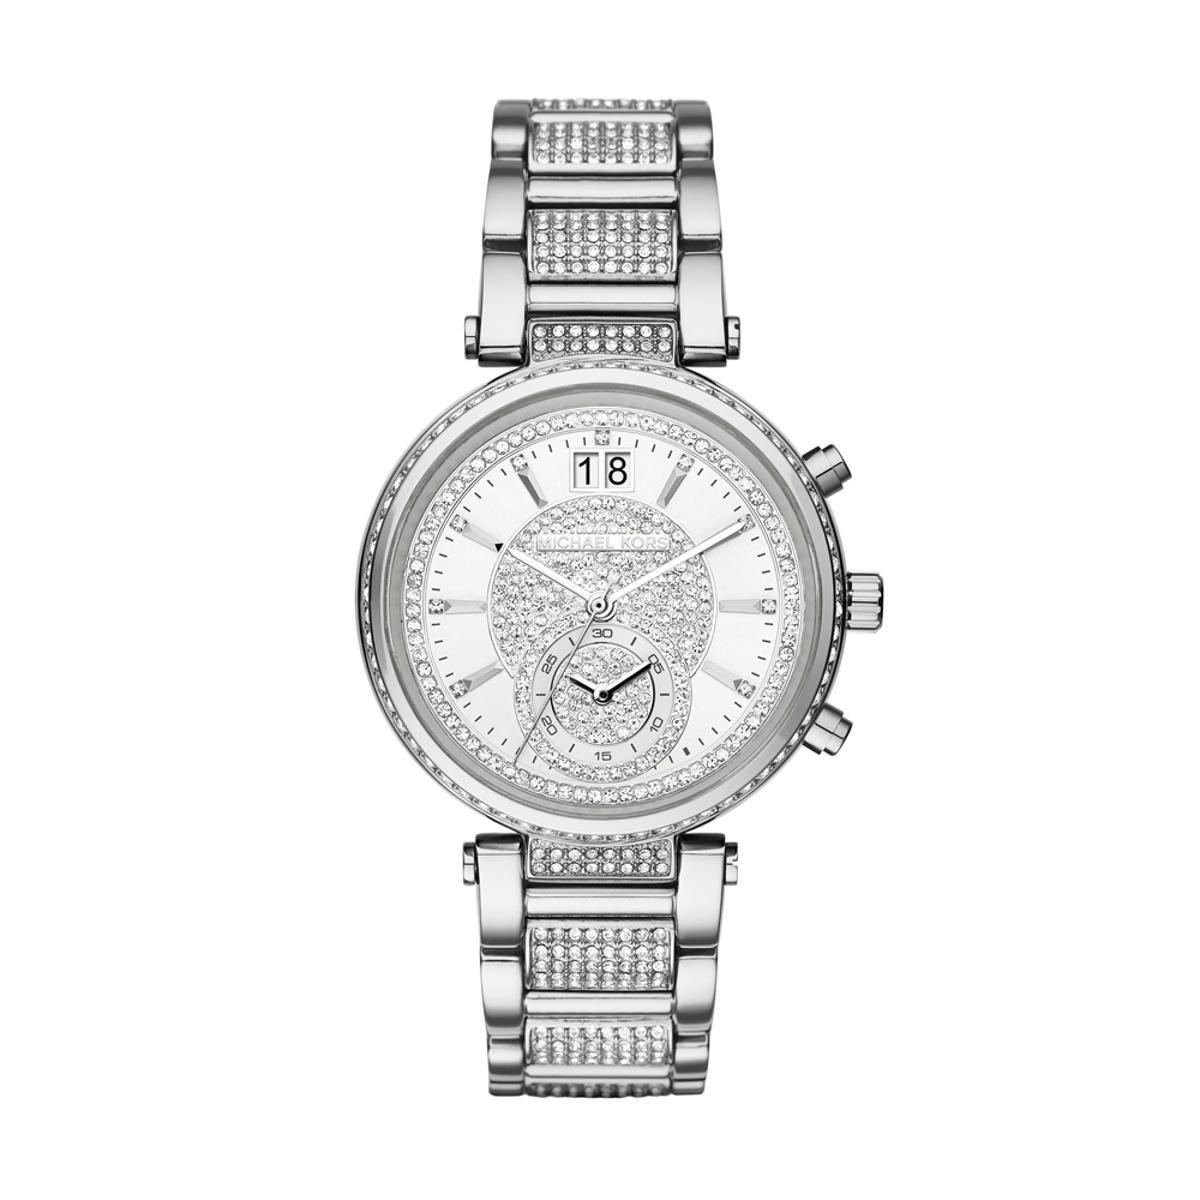 842287ebe2e67 Relógio Michael Kors Feminino - MK6281 1KN MK6281 1KN - Compre Agora ...